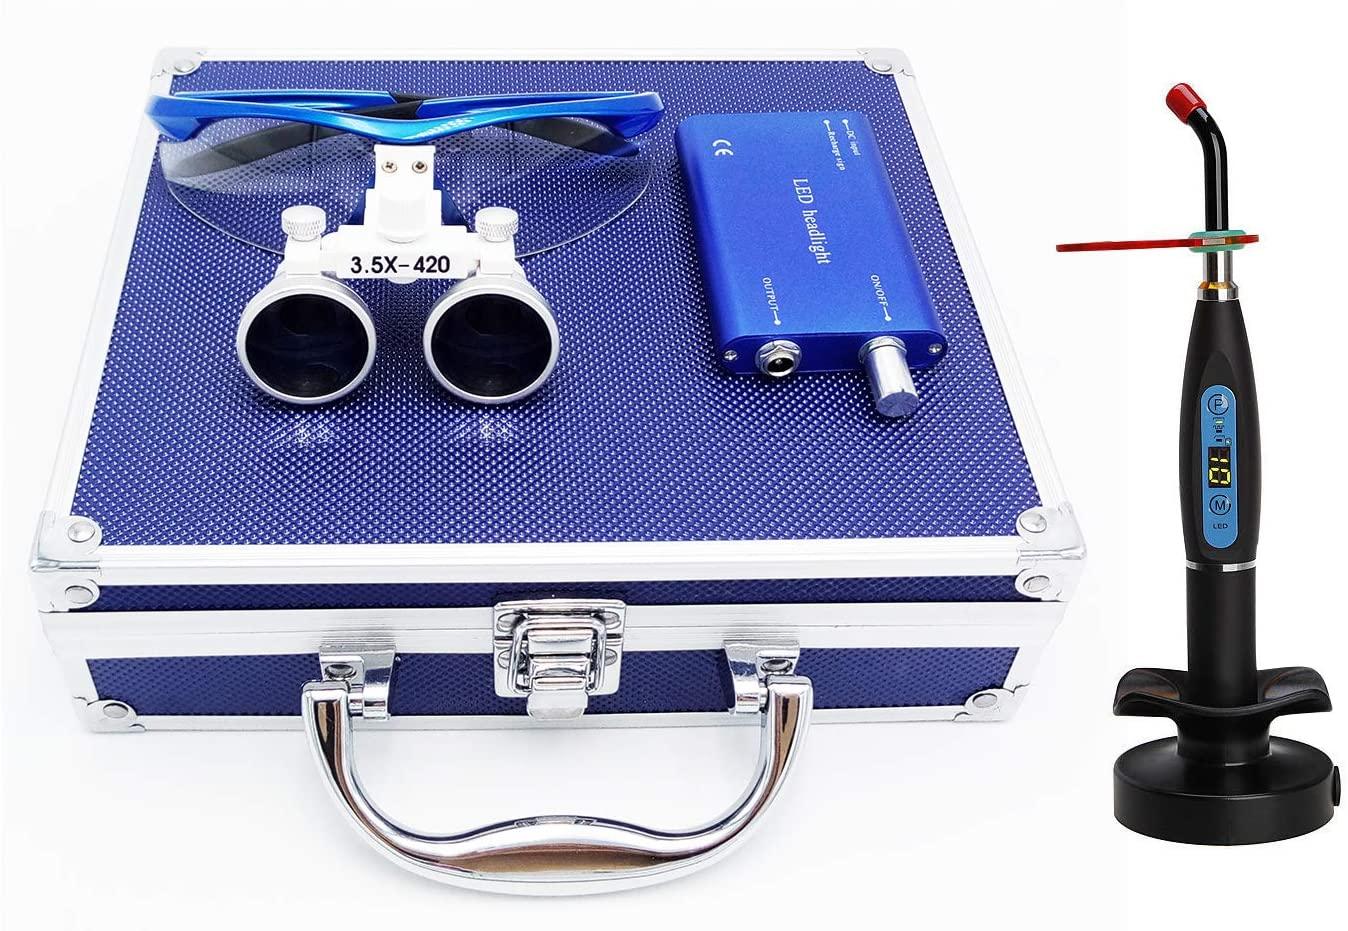 Zgood 3.5x420MM Surgical Binocular Loupes Optical Glass + Headlight + Blue Aluminum Box + 1PC LED Cordless Light Lamp